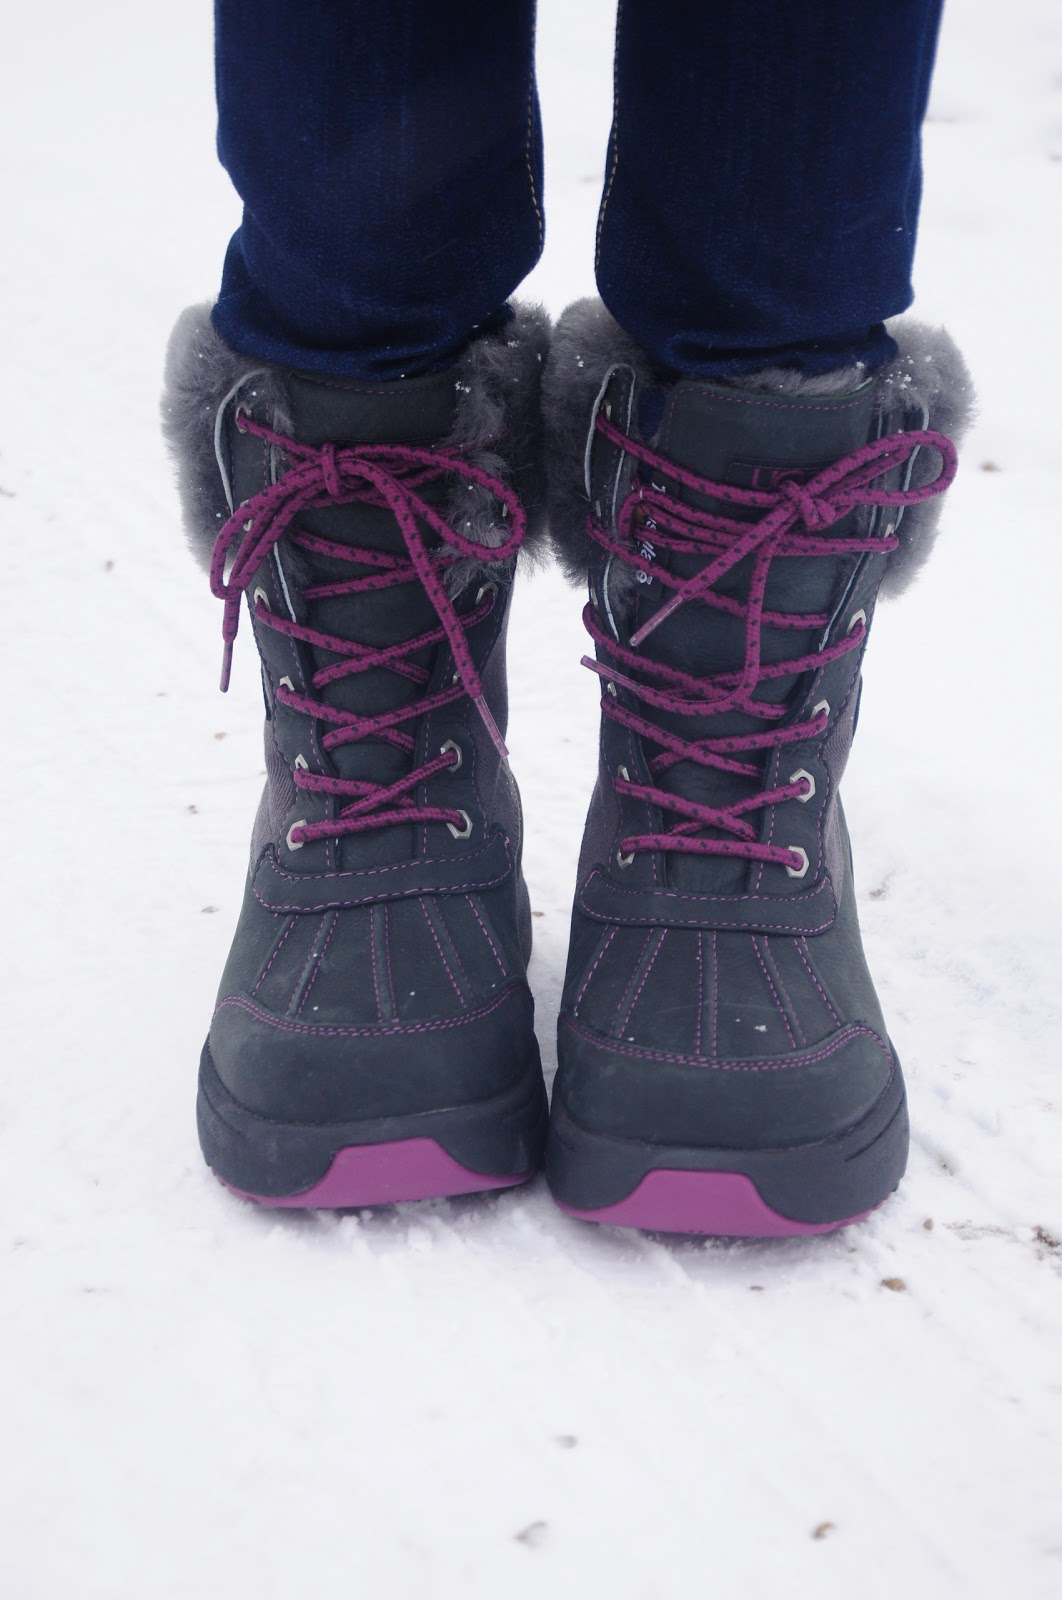 Snow Boots Wearing The Ugg Hoka Winter Boot Thread